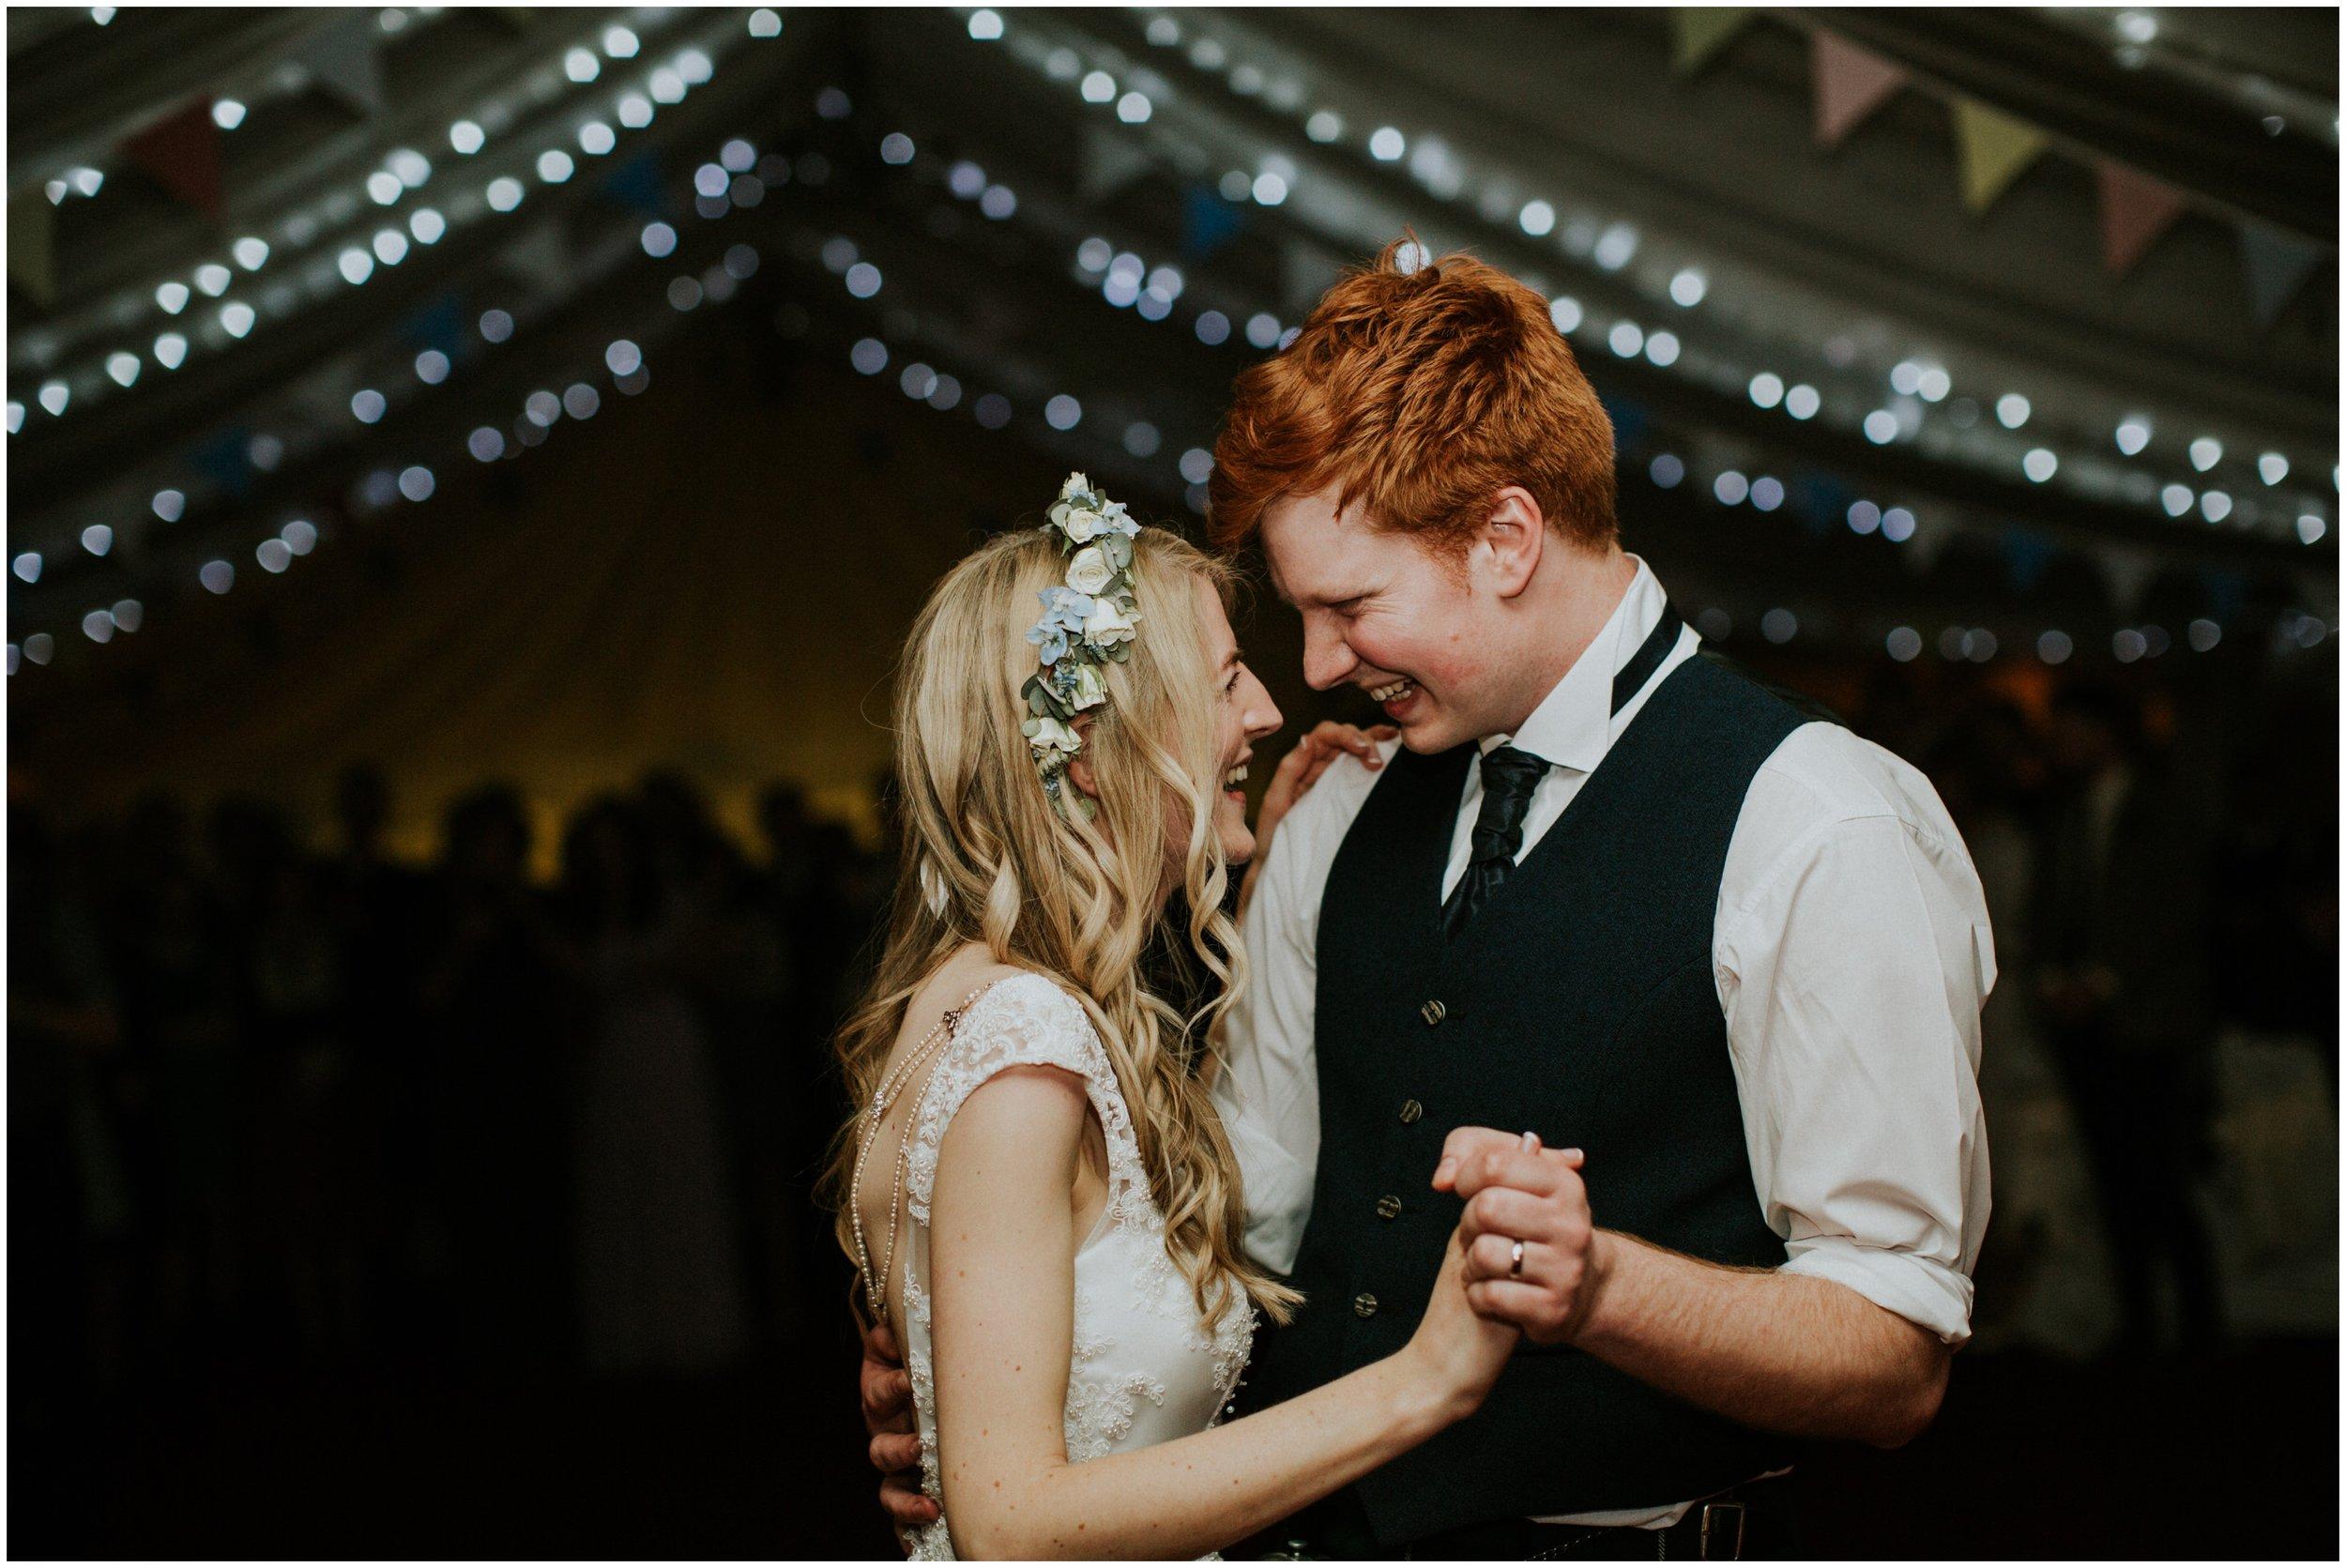 Photography 78 - Glasgow Wedding Photographer - Dave & Alana_0101.jpg